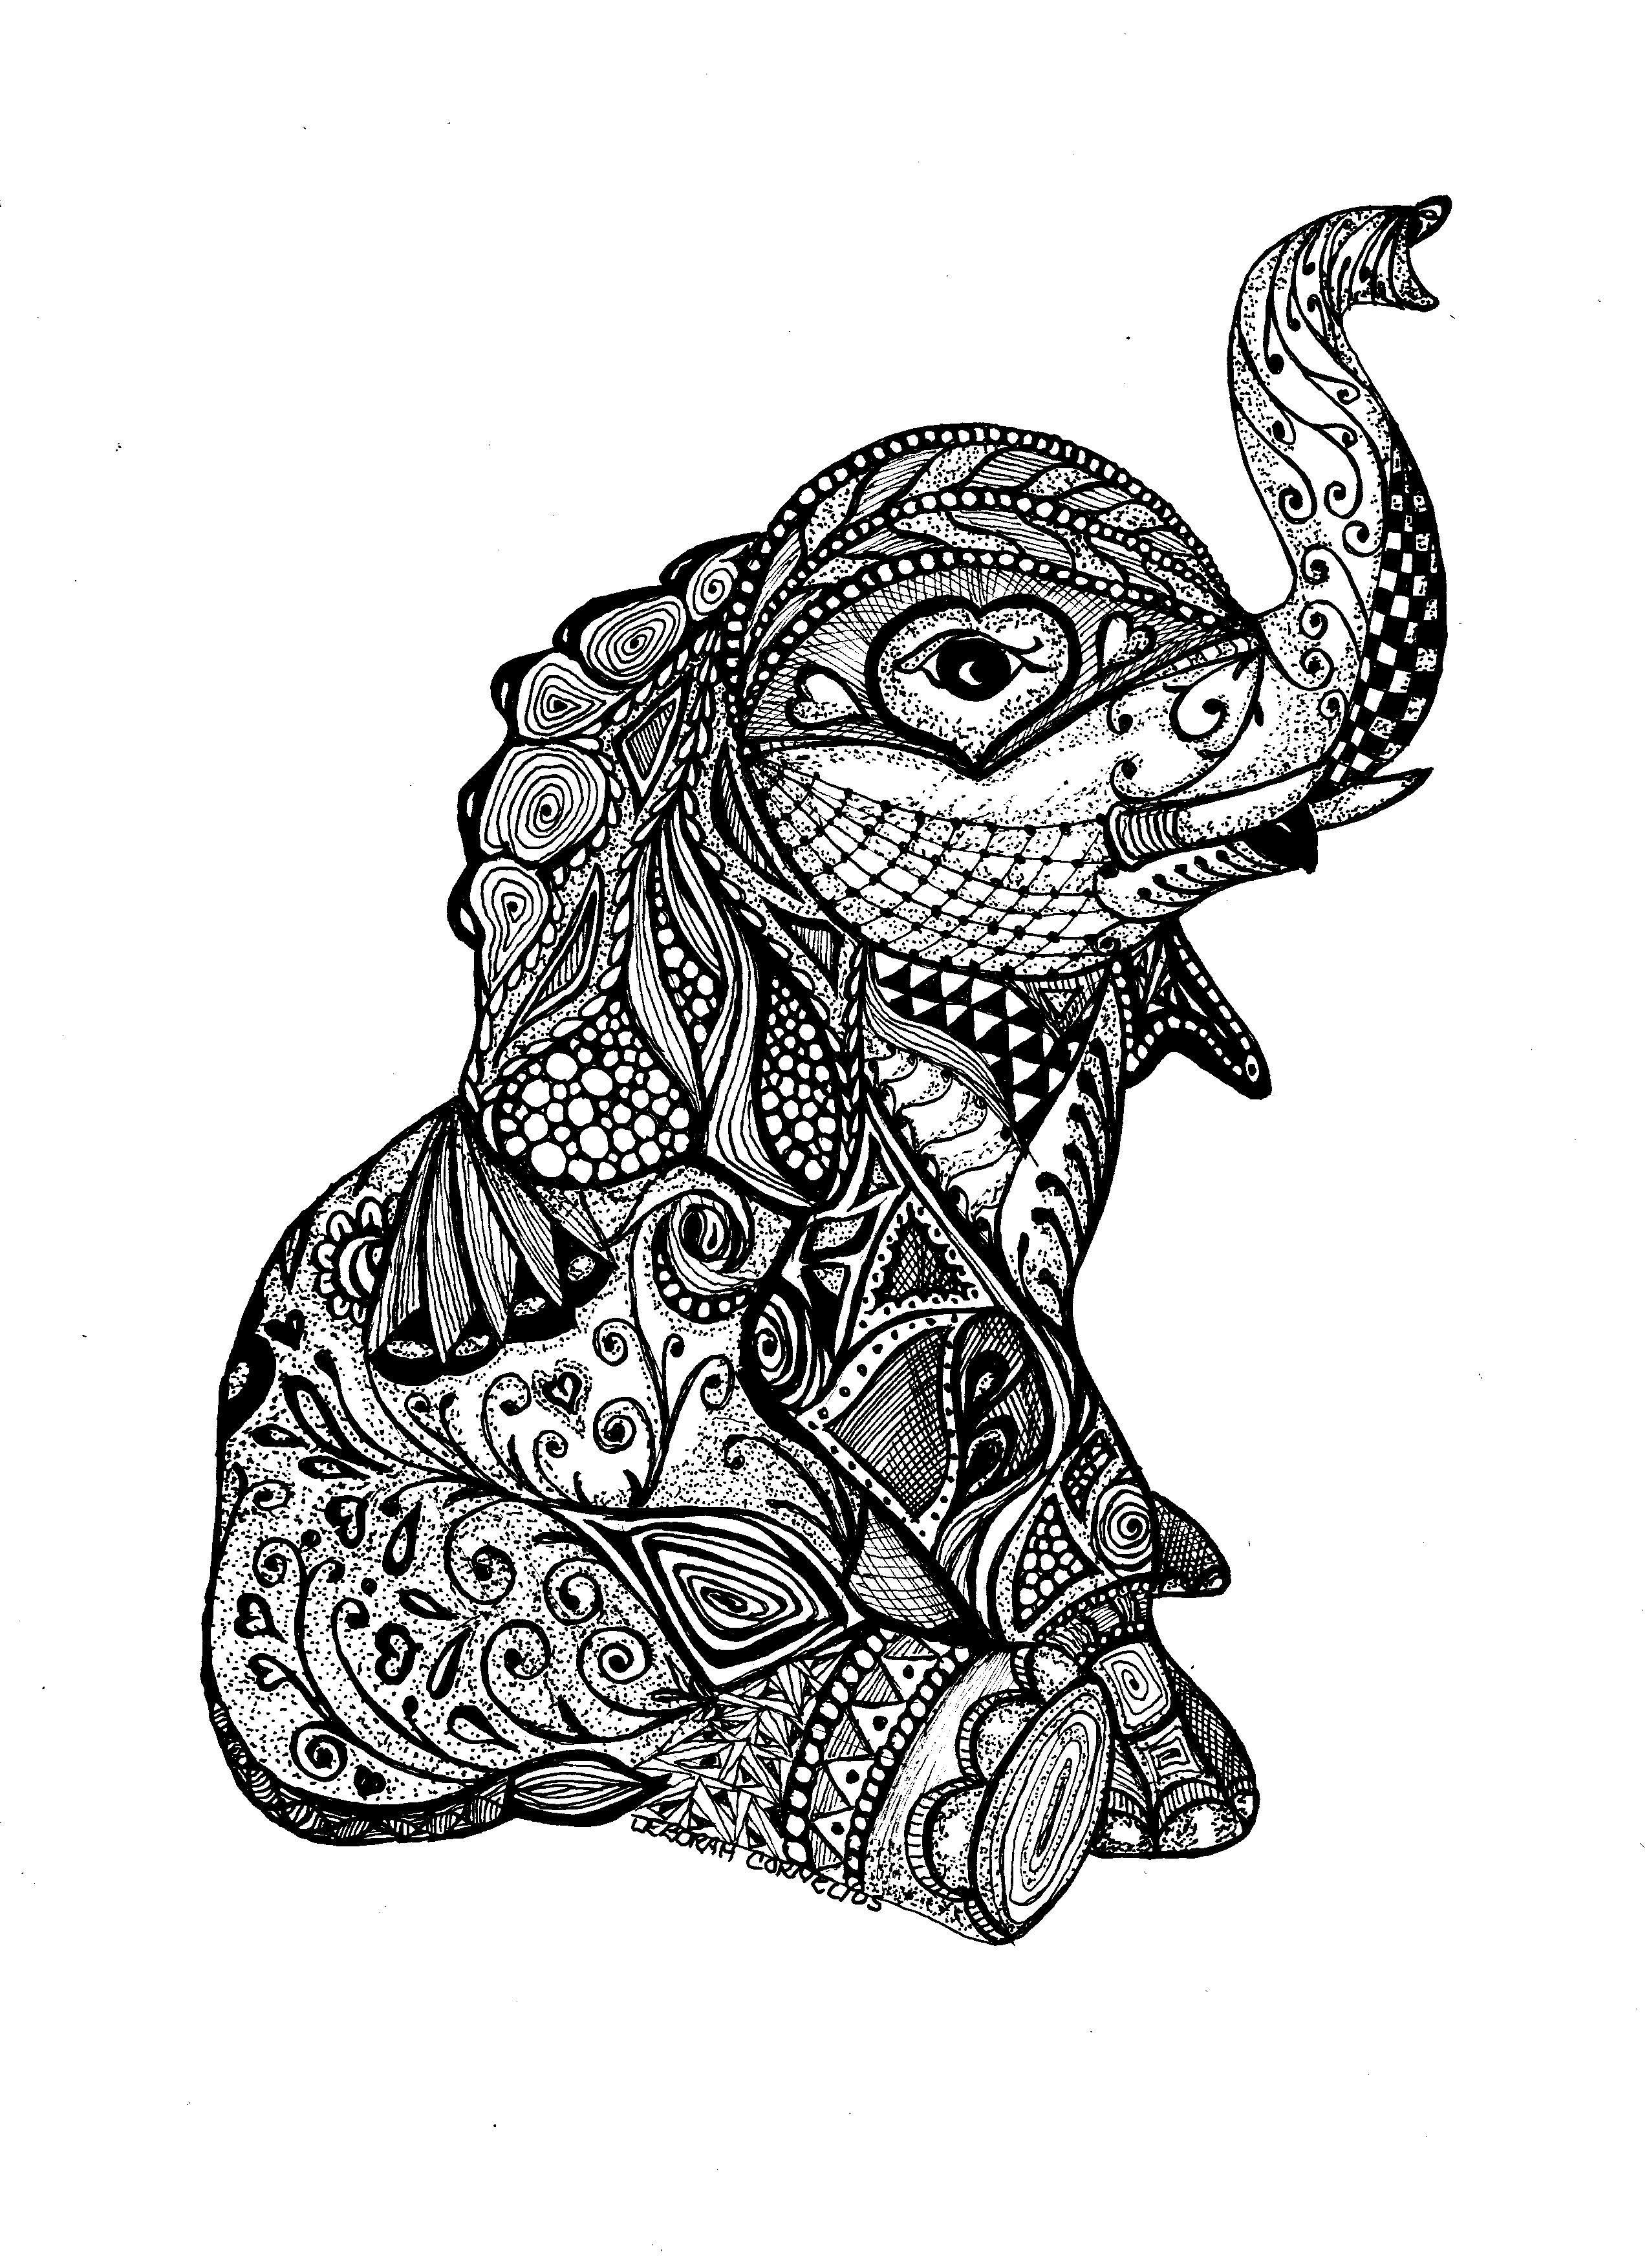 Doodle art elephant | Elephant tattoos, Tattoos, Zentangle ...